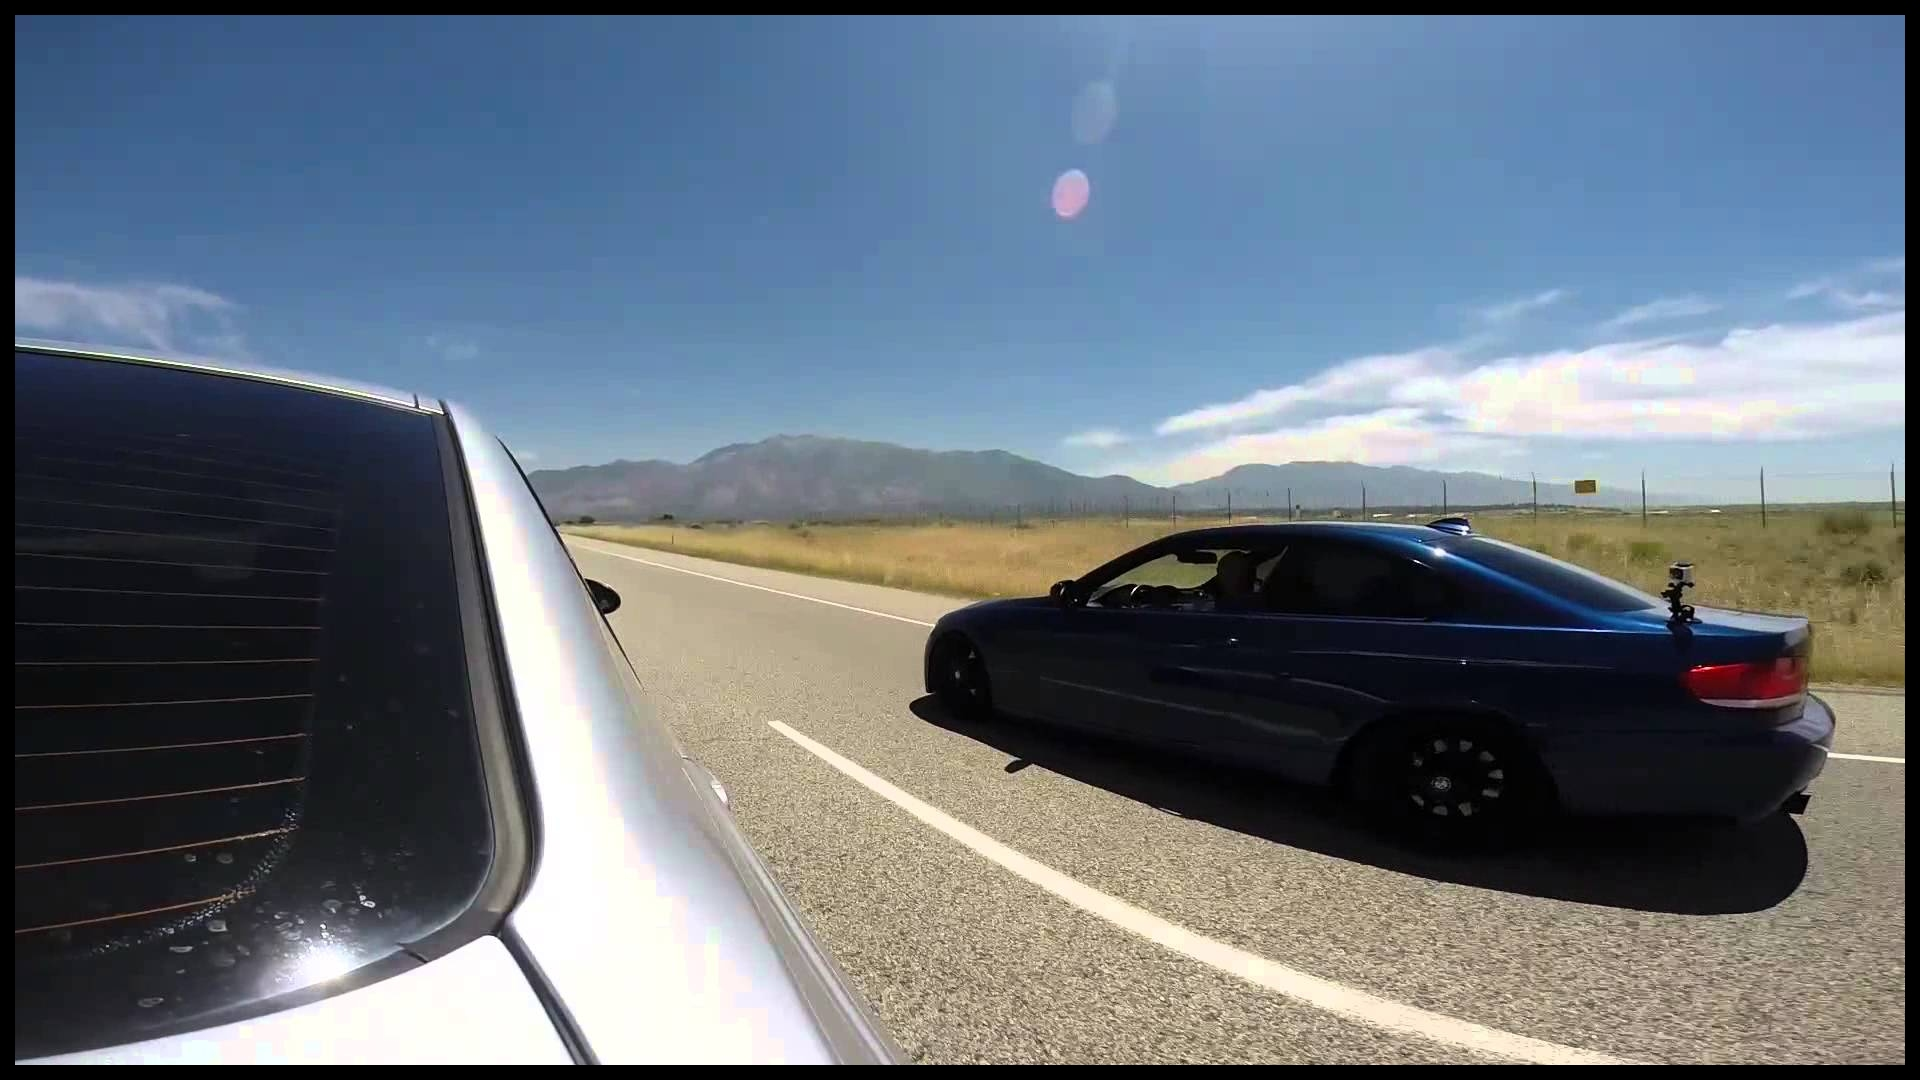 BMW 335i sedan vs Coupe